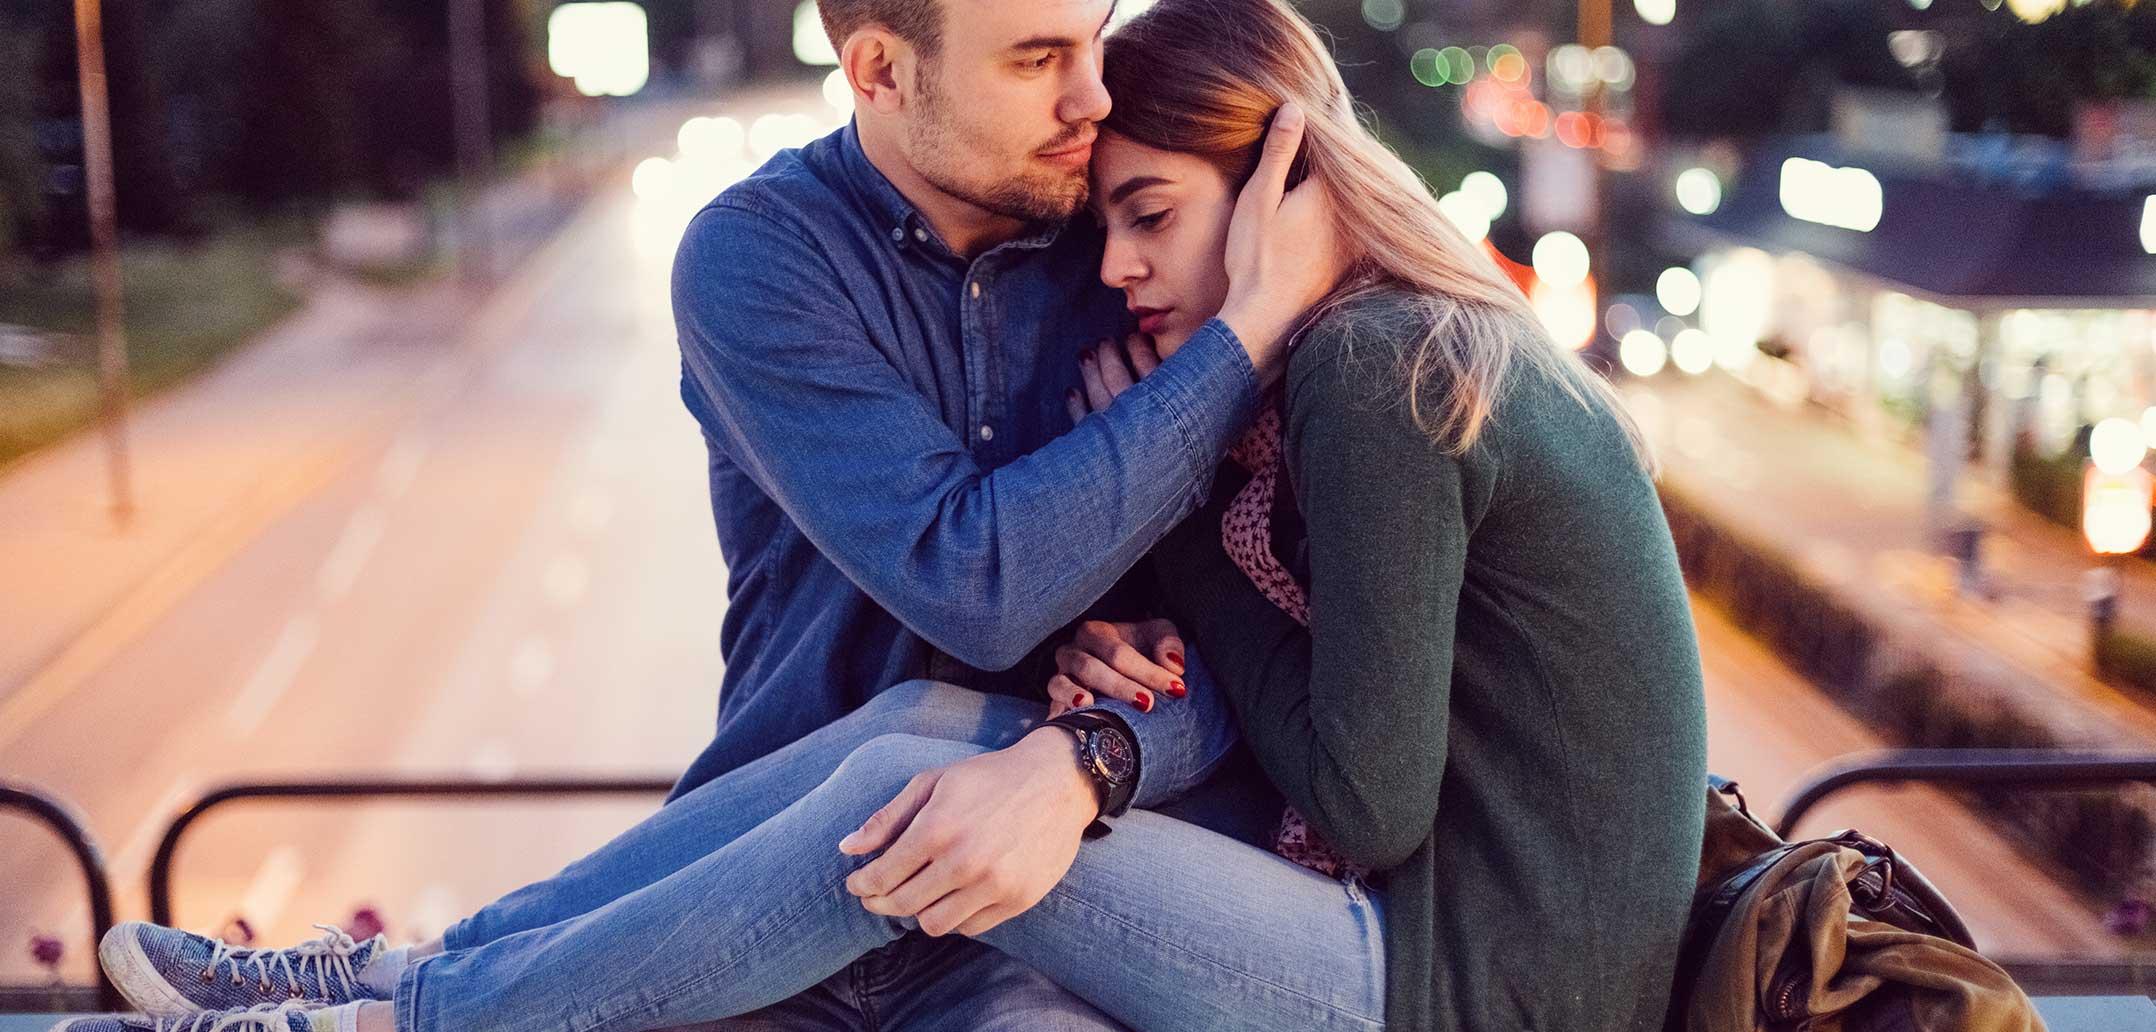 Selbstzweifel nagen am Partner und an der Beziehung